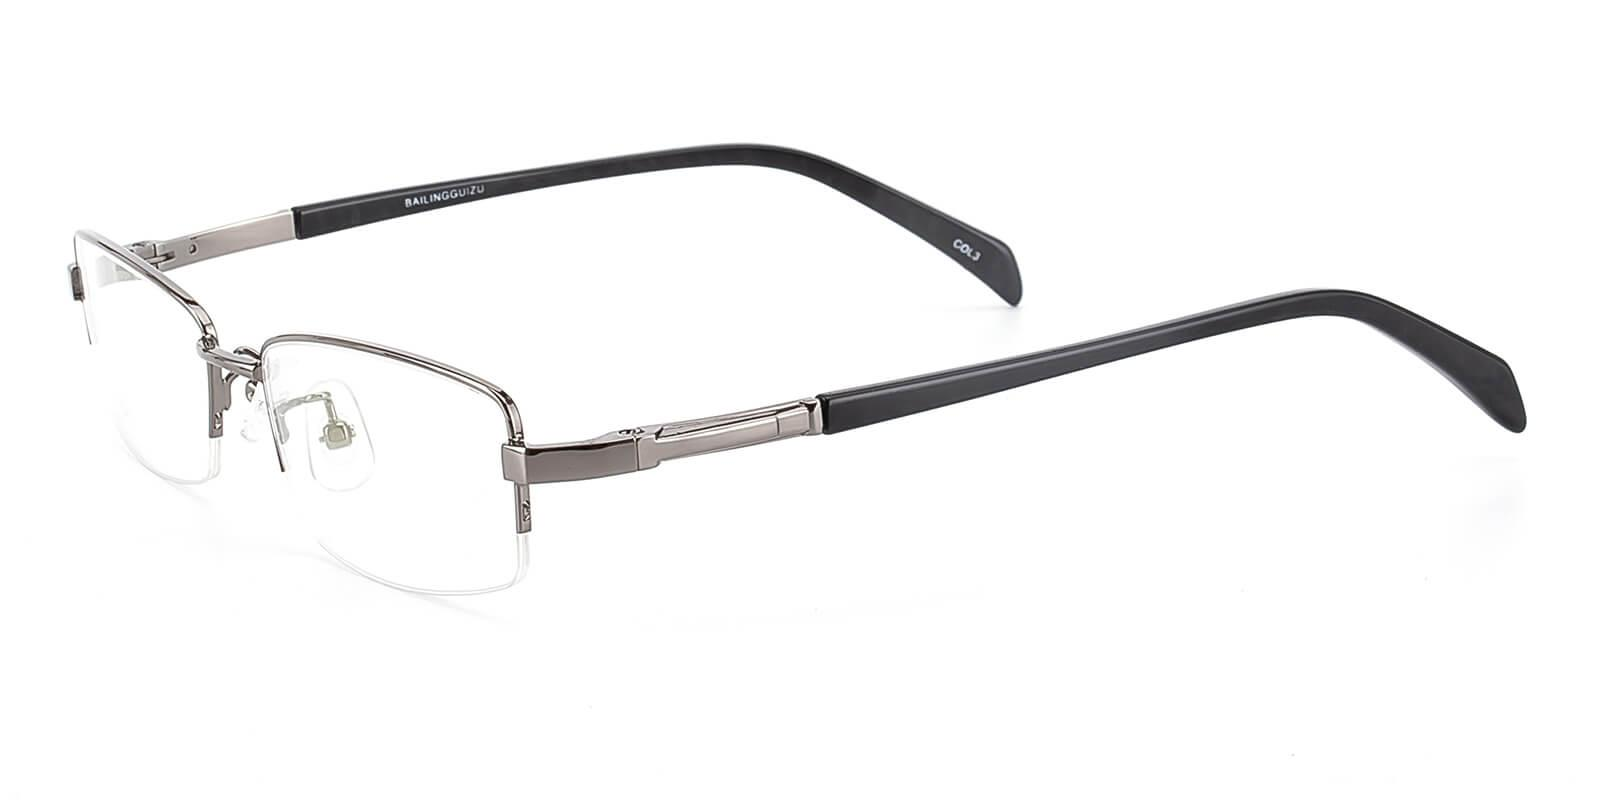 Furox-Gun-Rectangle-Metal-Eyeglasses-detail